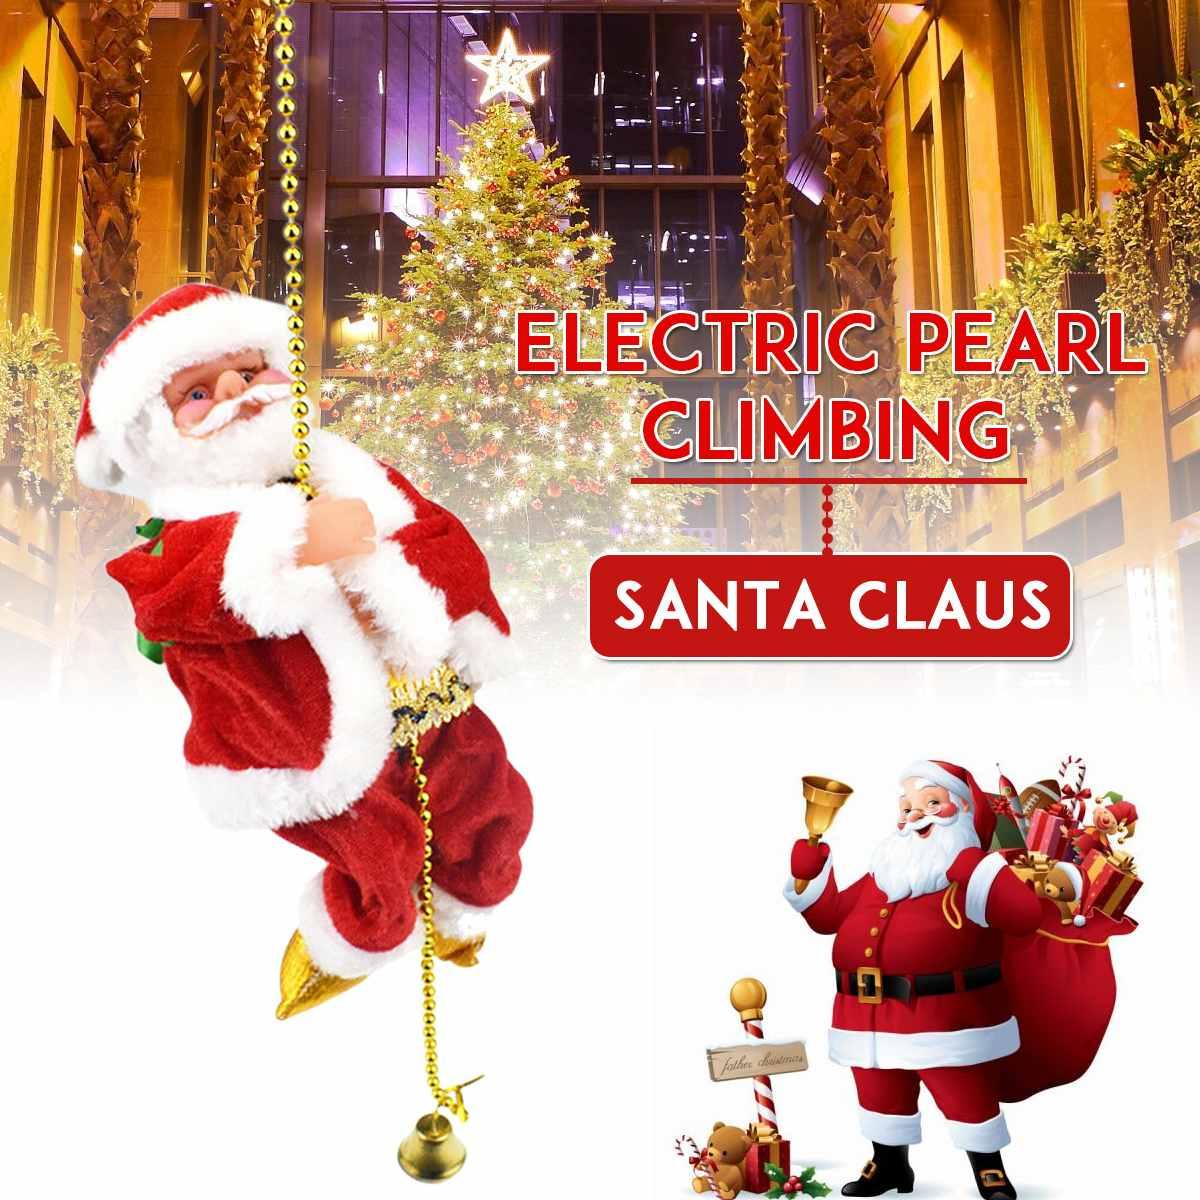 US Electric Santa Claus Climbing Rope Christmas Xmas Funny Plush Toy Decor Gift